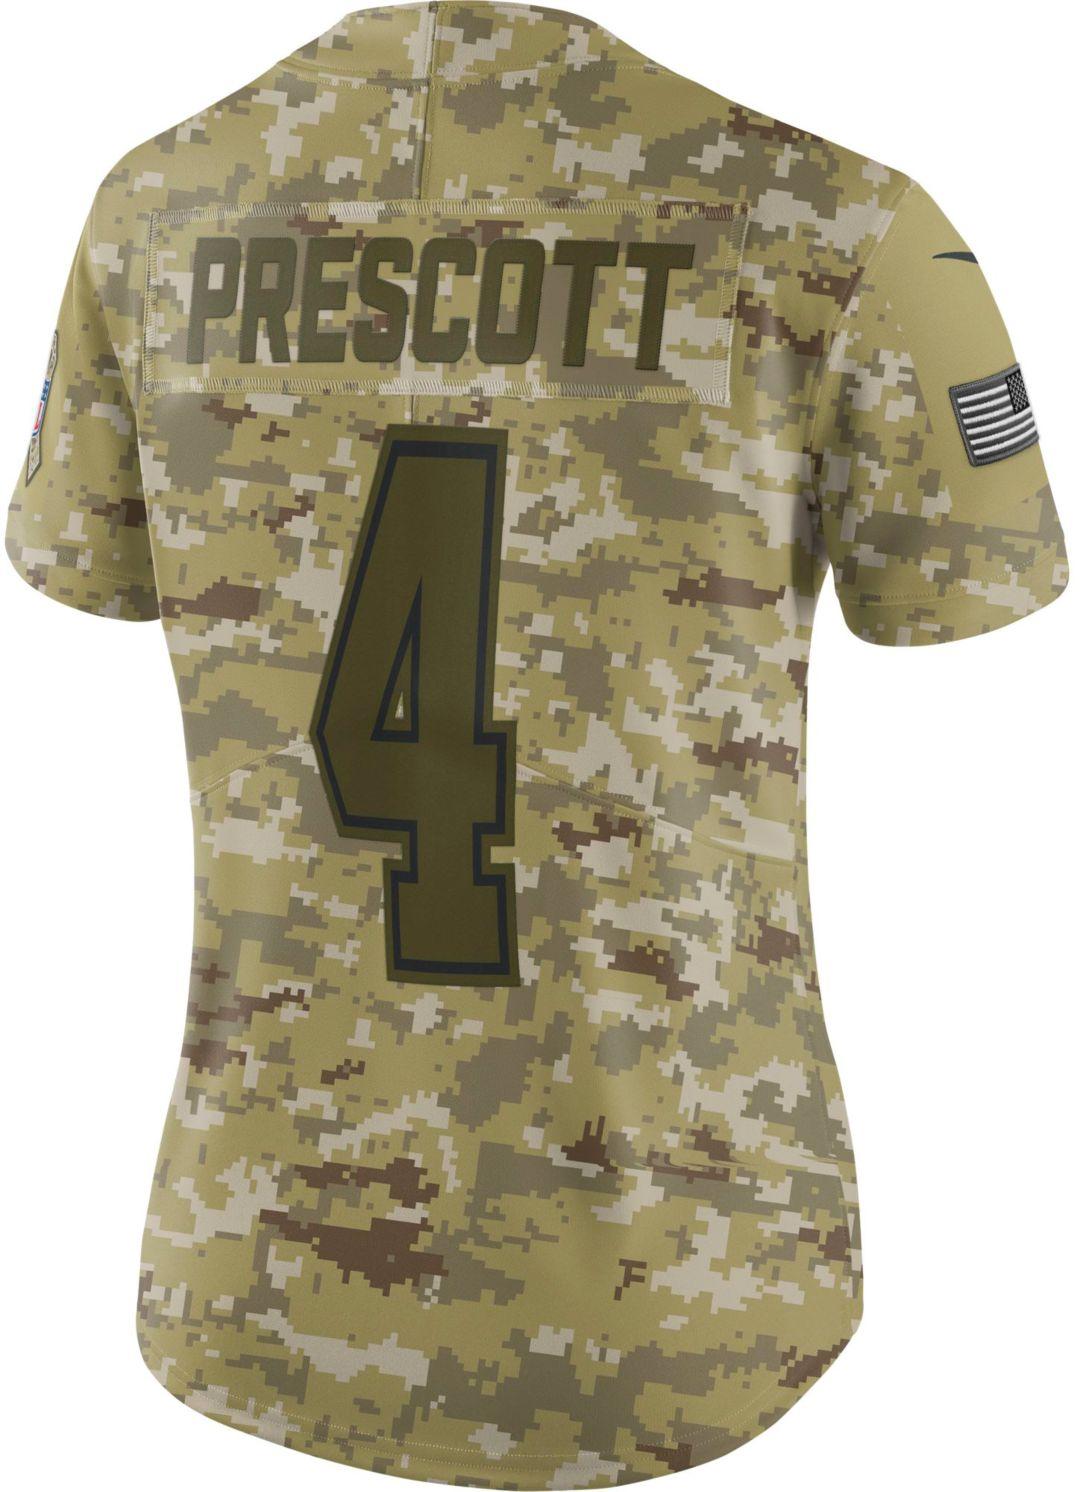 5f2fbe2bd79 Nike Women's Salute to Service Dallas Cowboys Dak Prescott #4 Limited  Camouflage Jersey 3